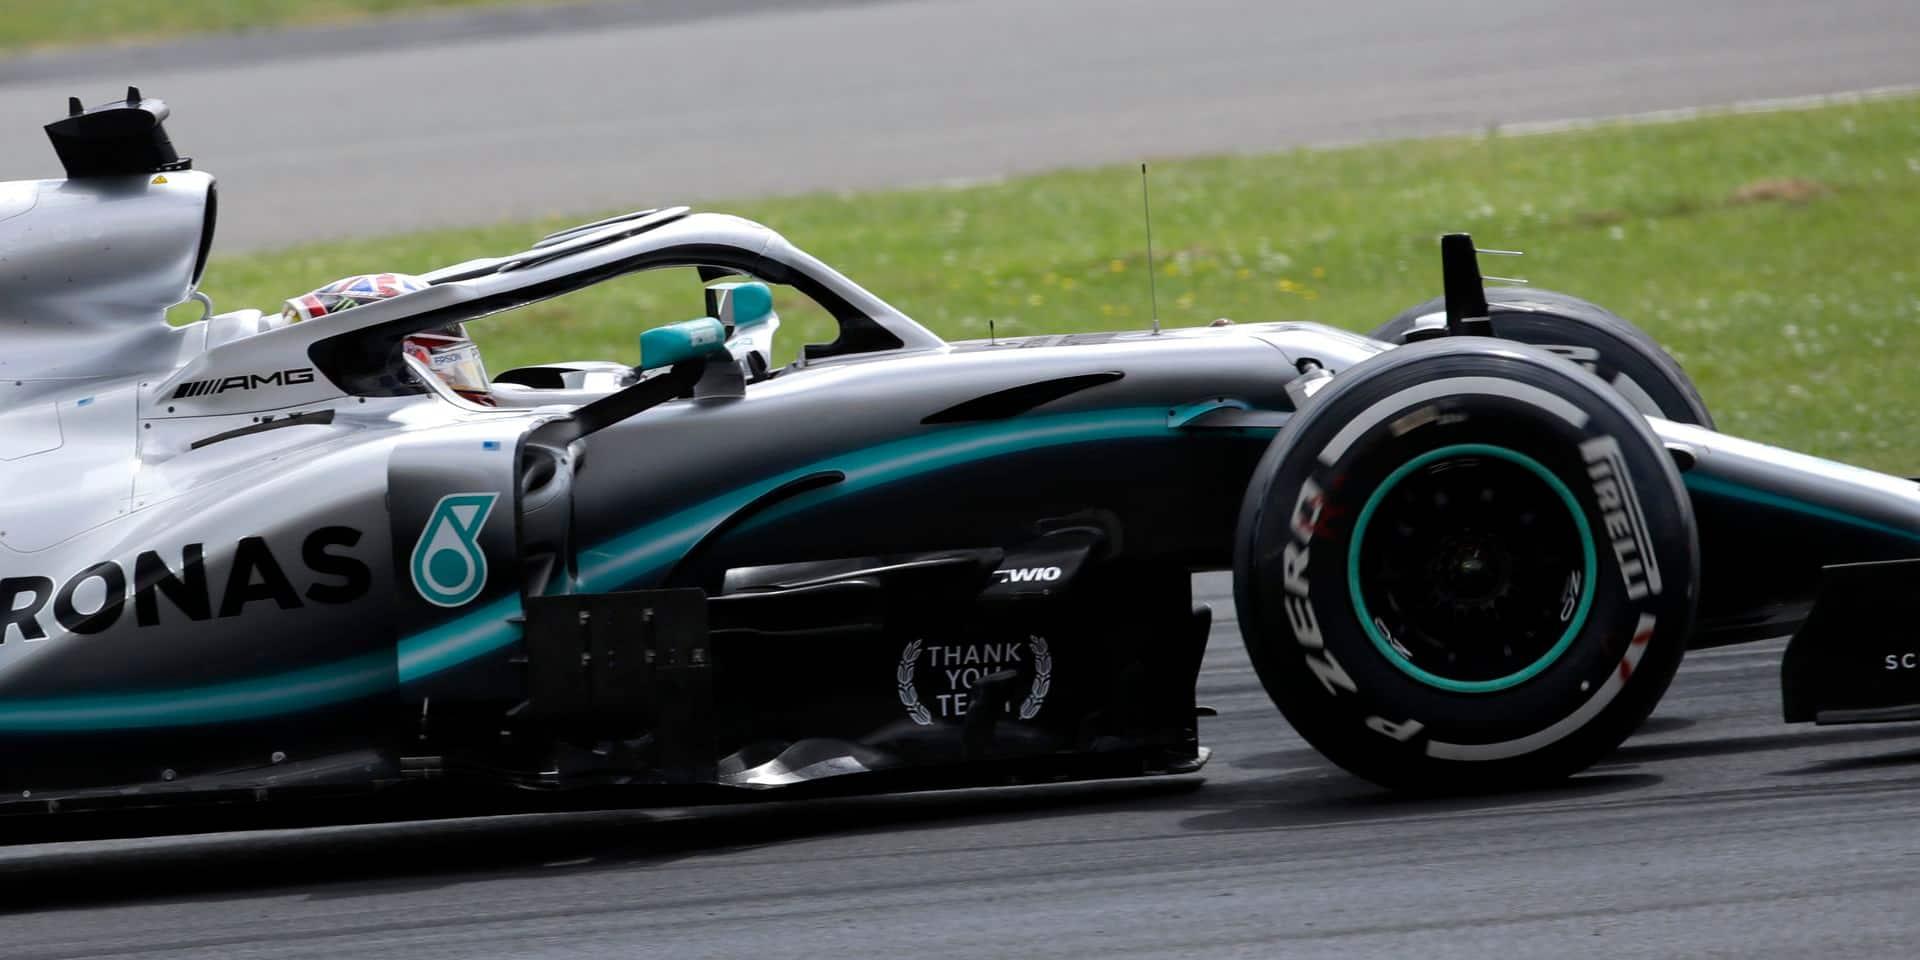 Hamilton remporte le GP de Grande-Bretagne pour la 6e fois